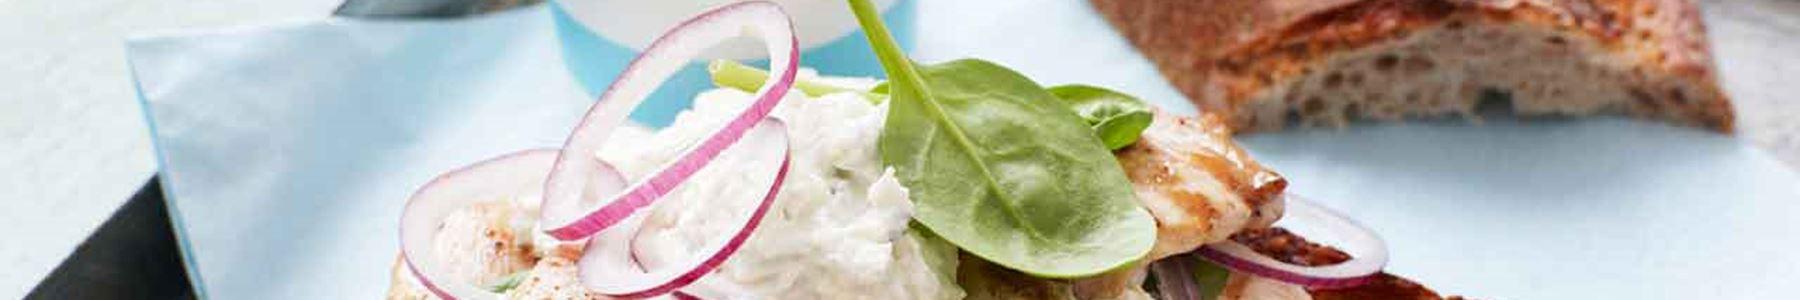 Kalorisnål + Kesella® + Lunch